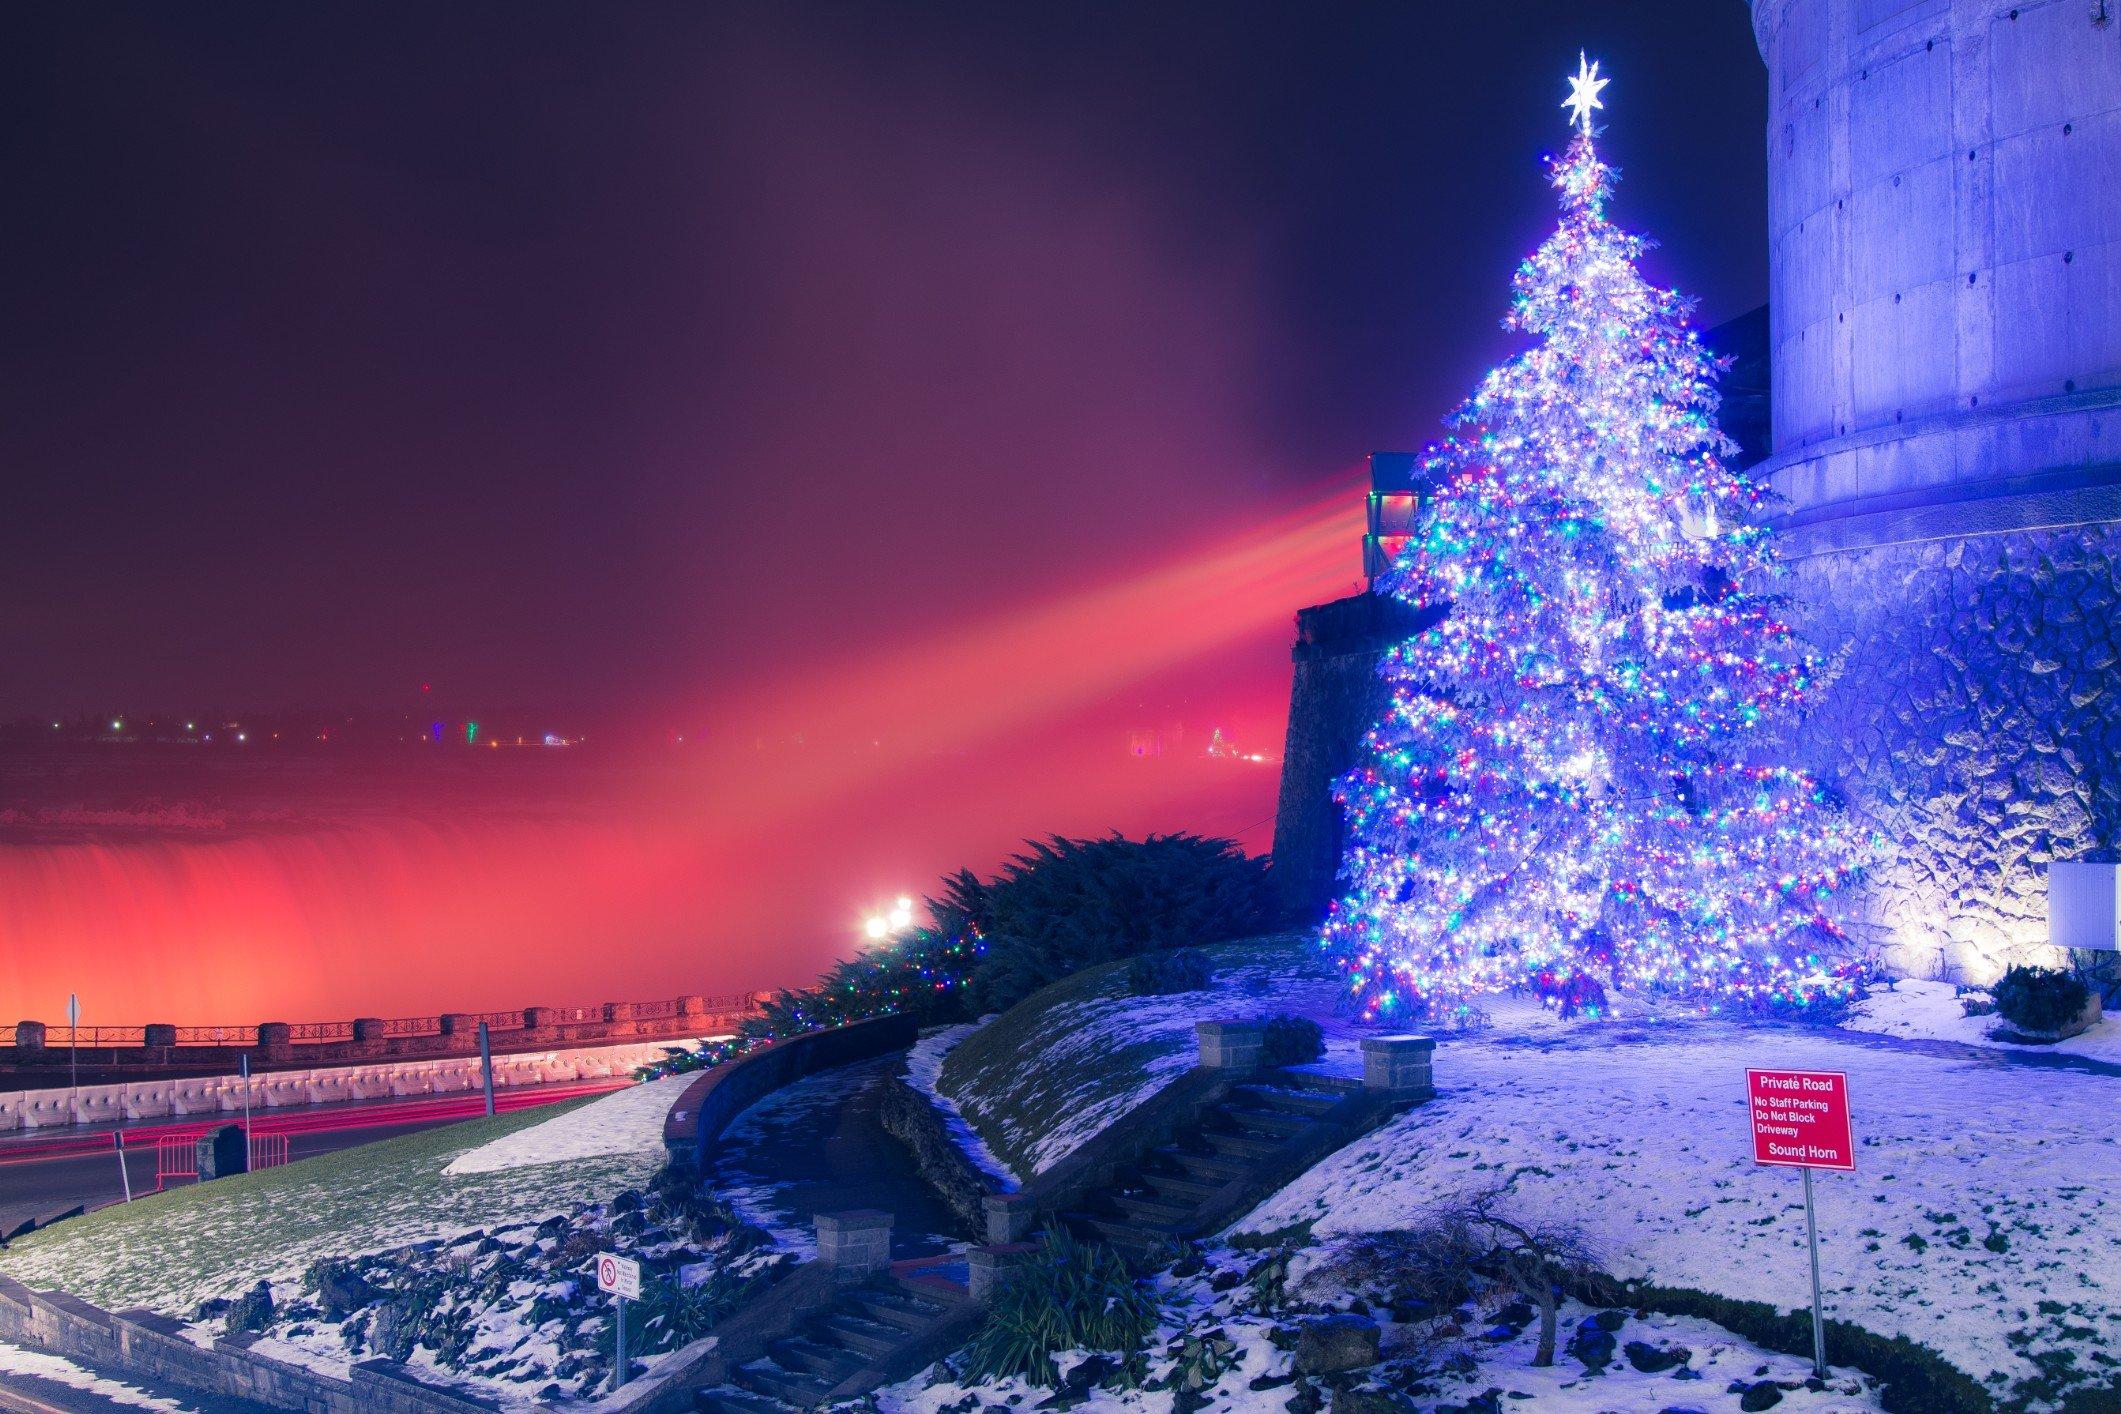 Top 10 Holiday Events And Activities In Niagara Niagara